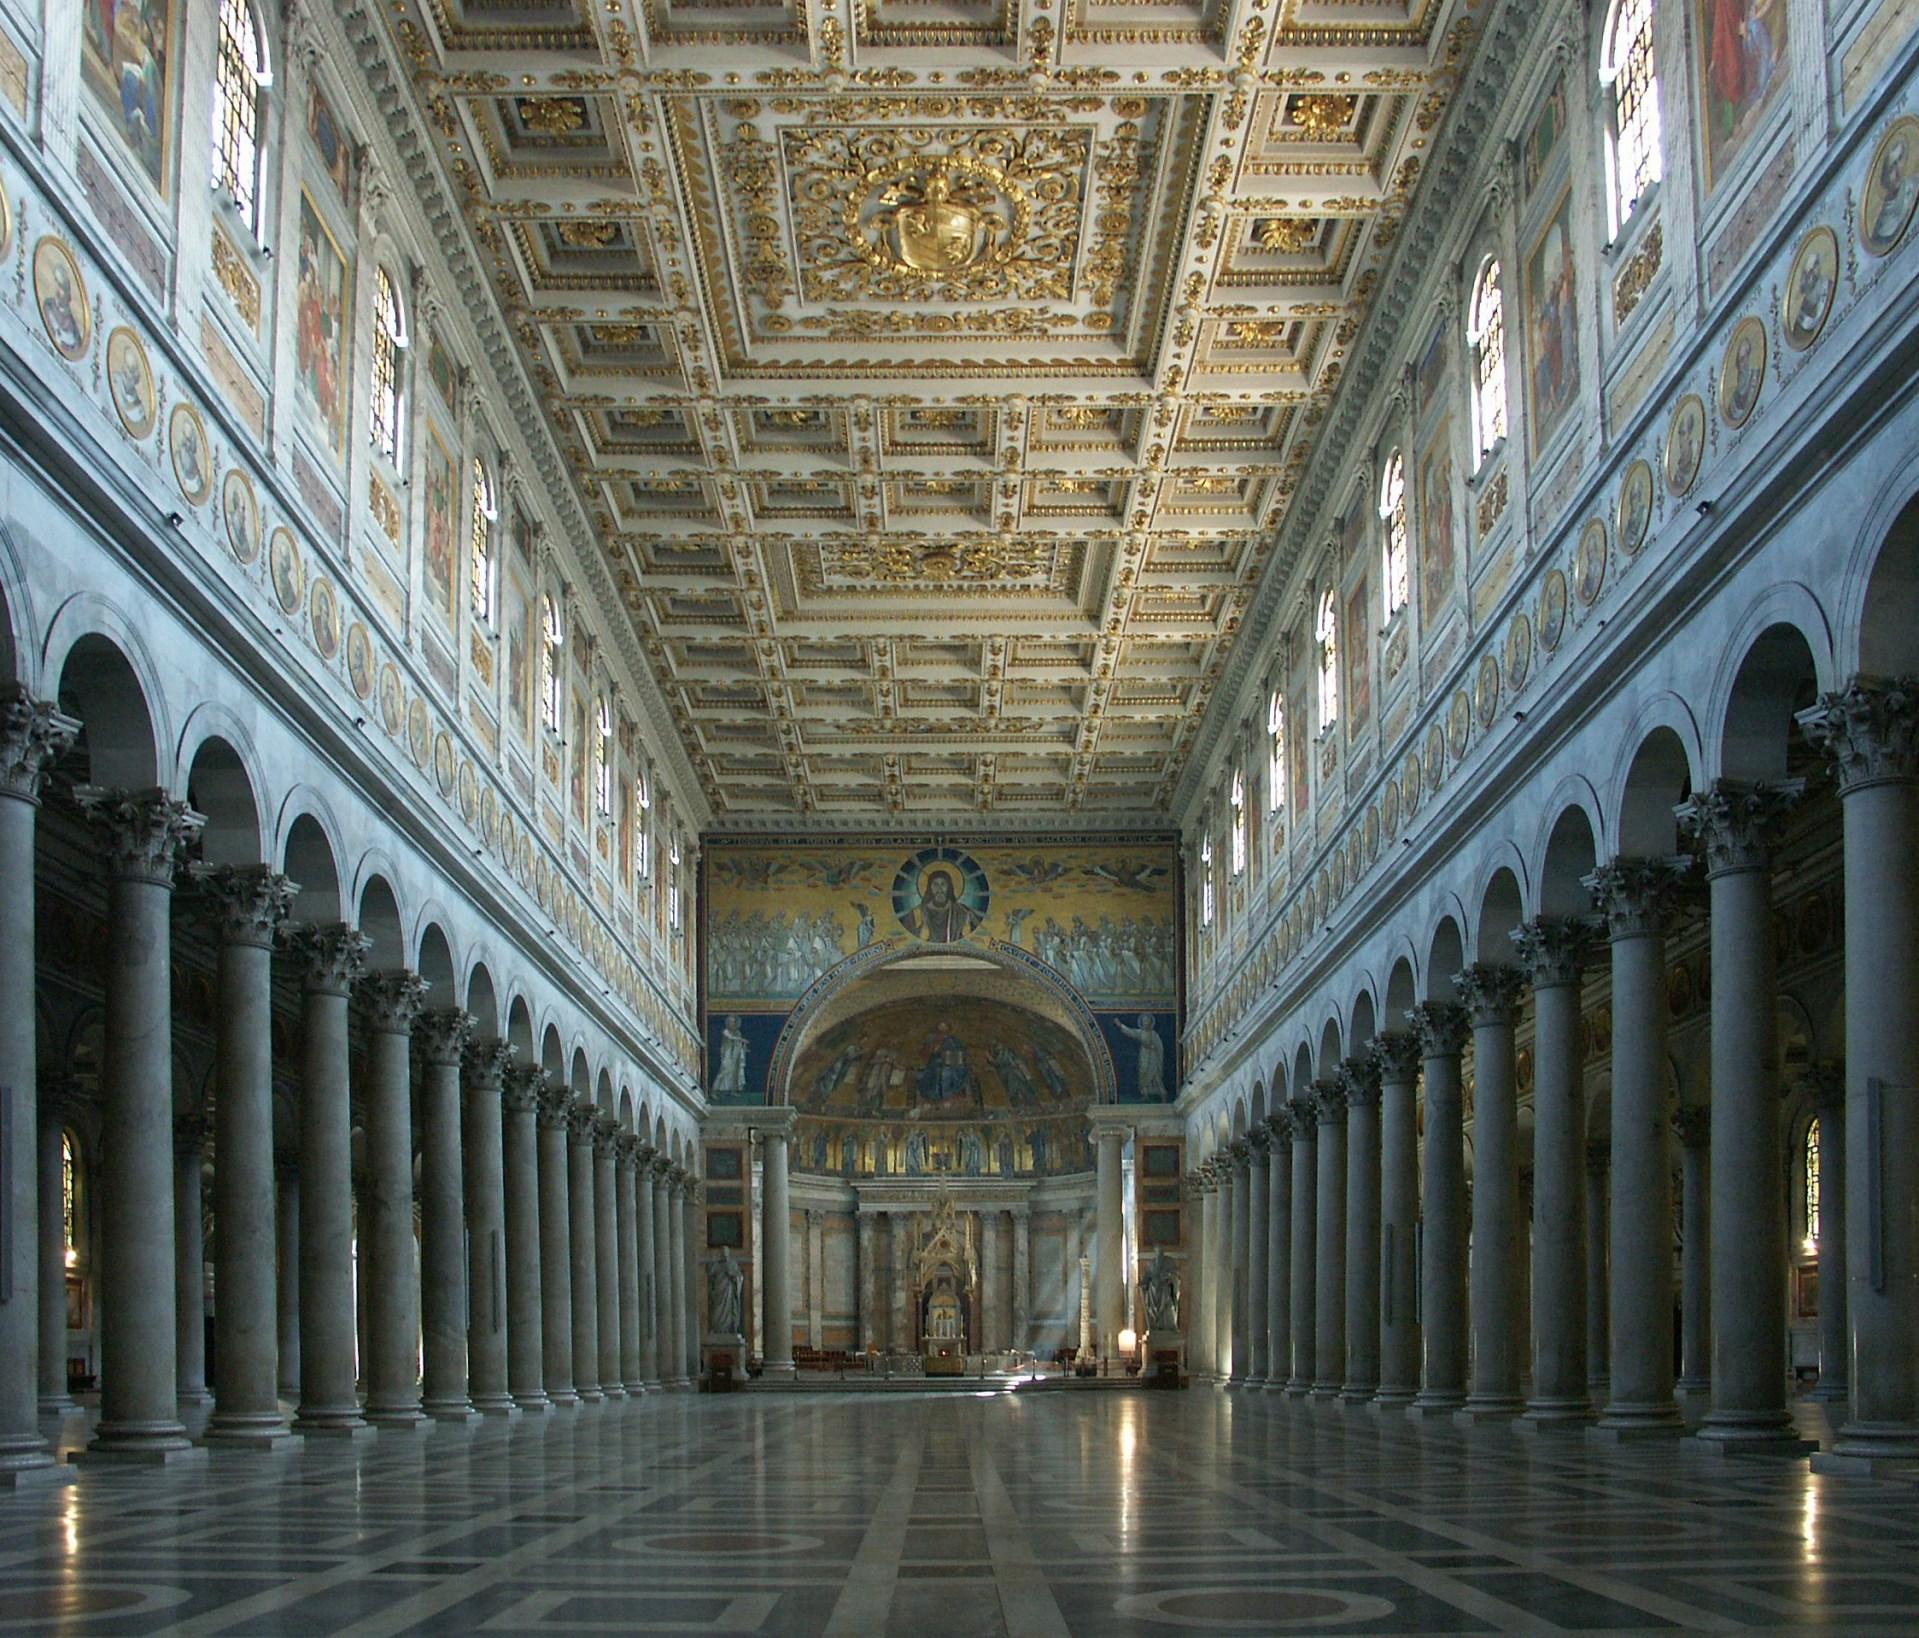 https://wp.en.aleteia.org/wp-content/uploads/sites/2/2021/01/web3-saint-pauls-basilica-wiki.jpg?w=1920